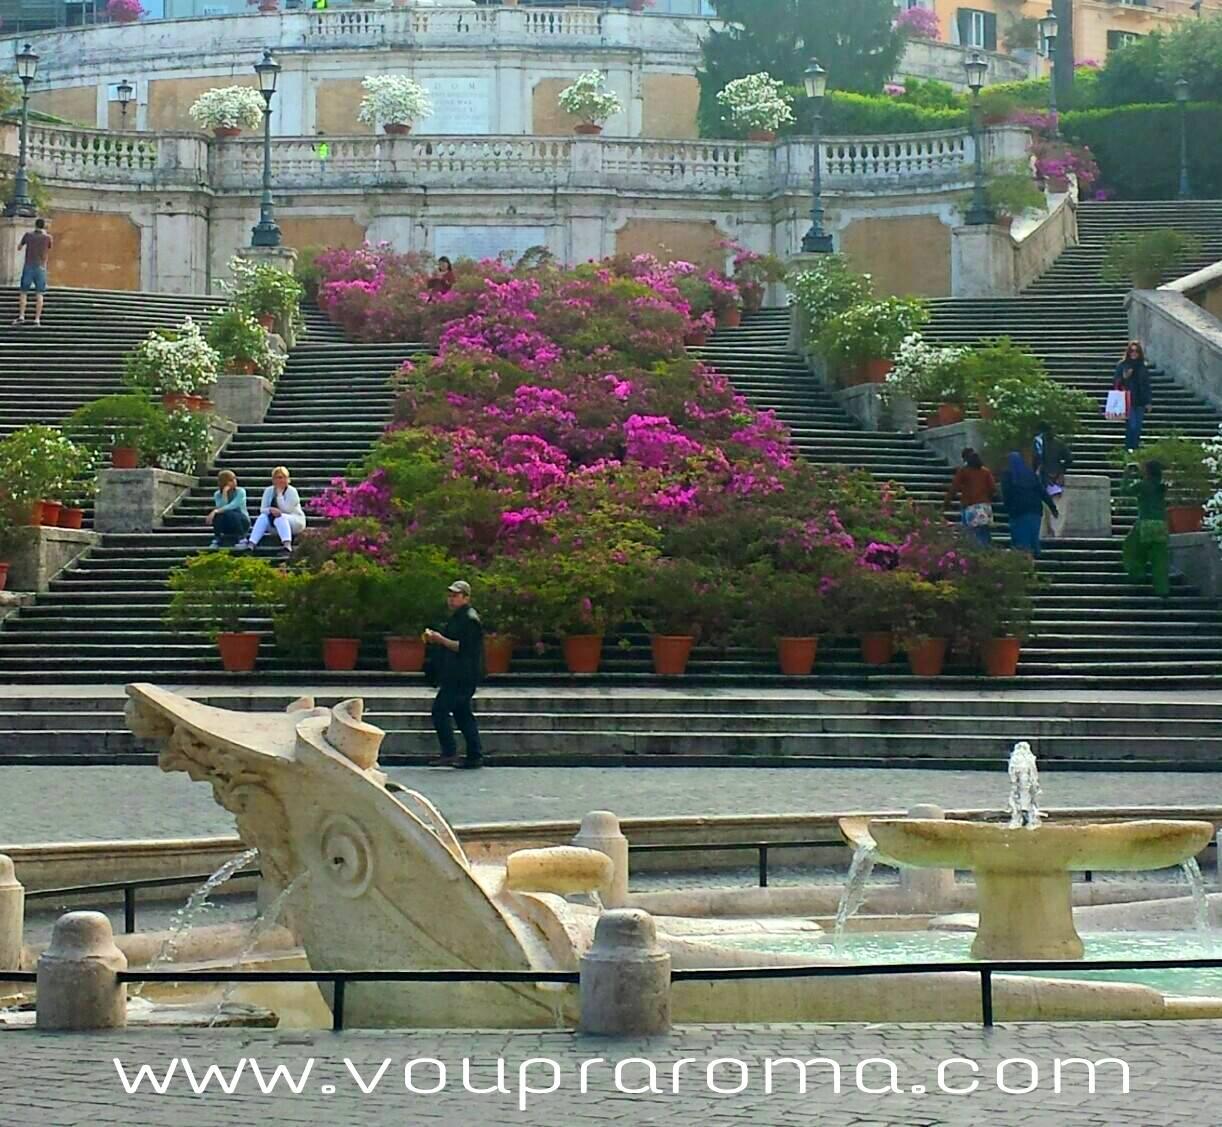 Piazza di Spagna - Flores na Escadaria - Blog VoupraRoma